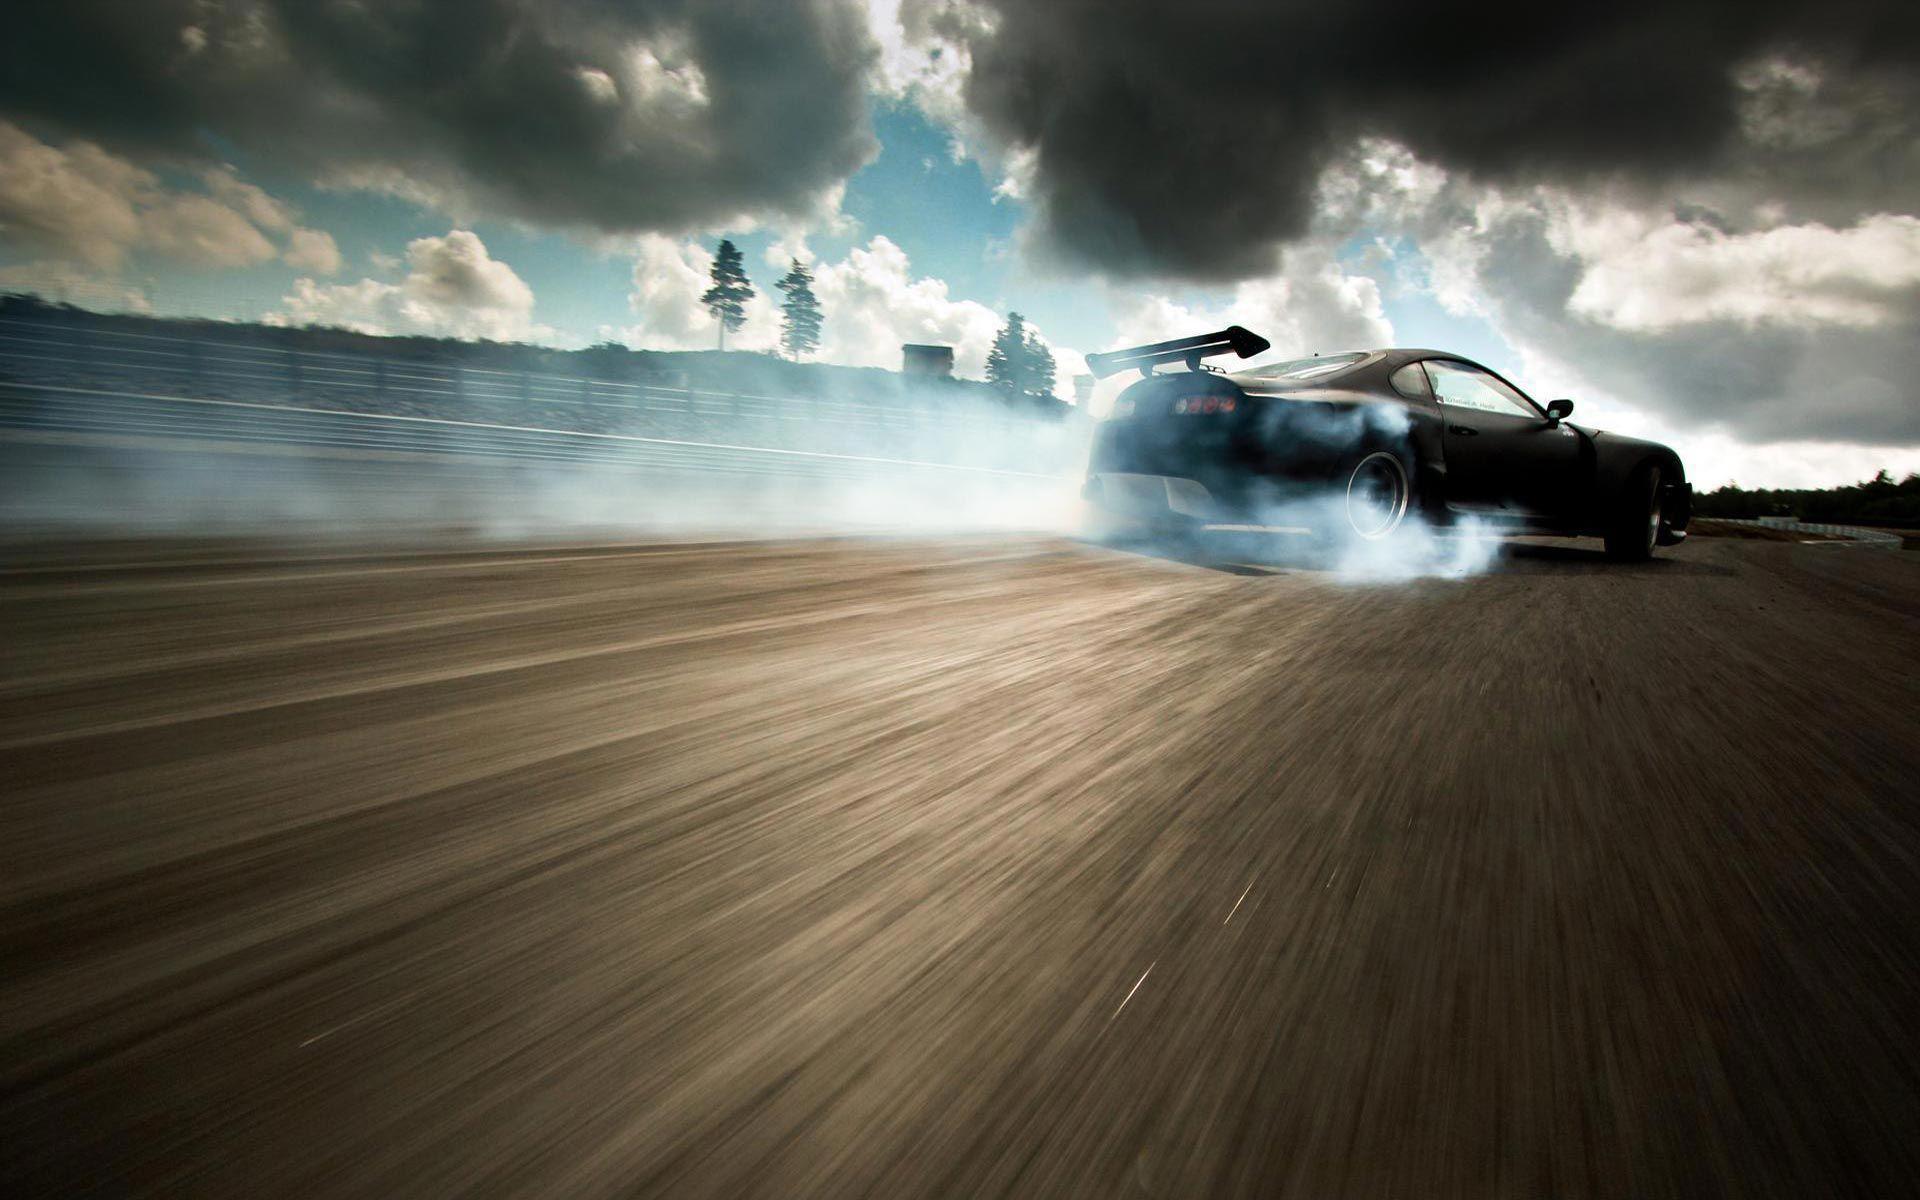 Supra Drift Wallpaper For Iphone Mym Toyota Supra Driving Academy Supra